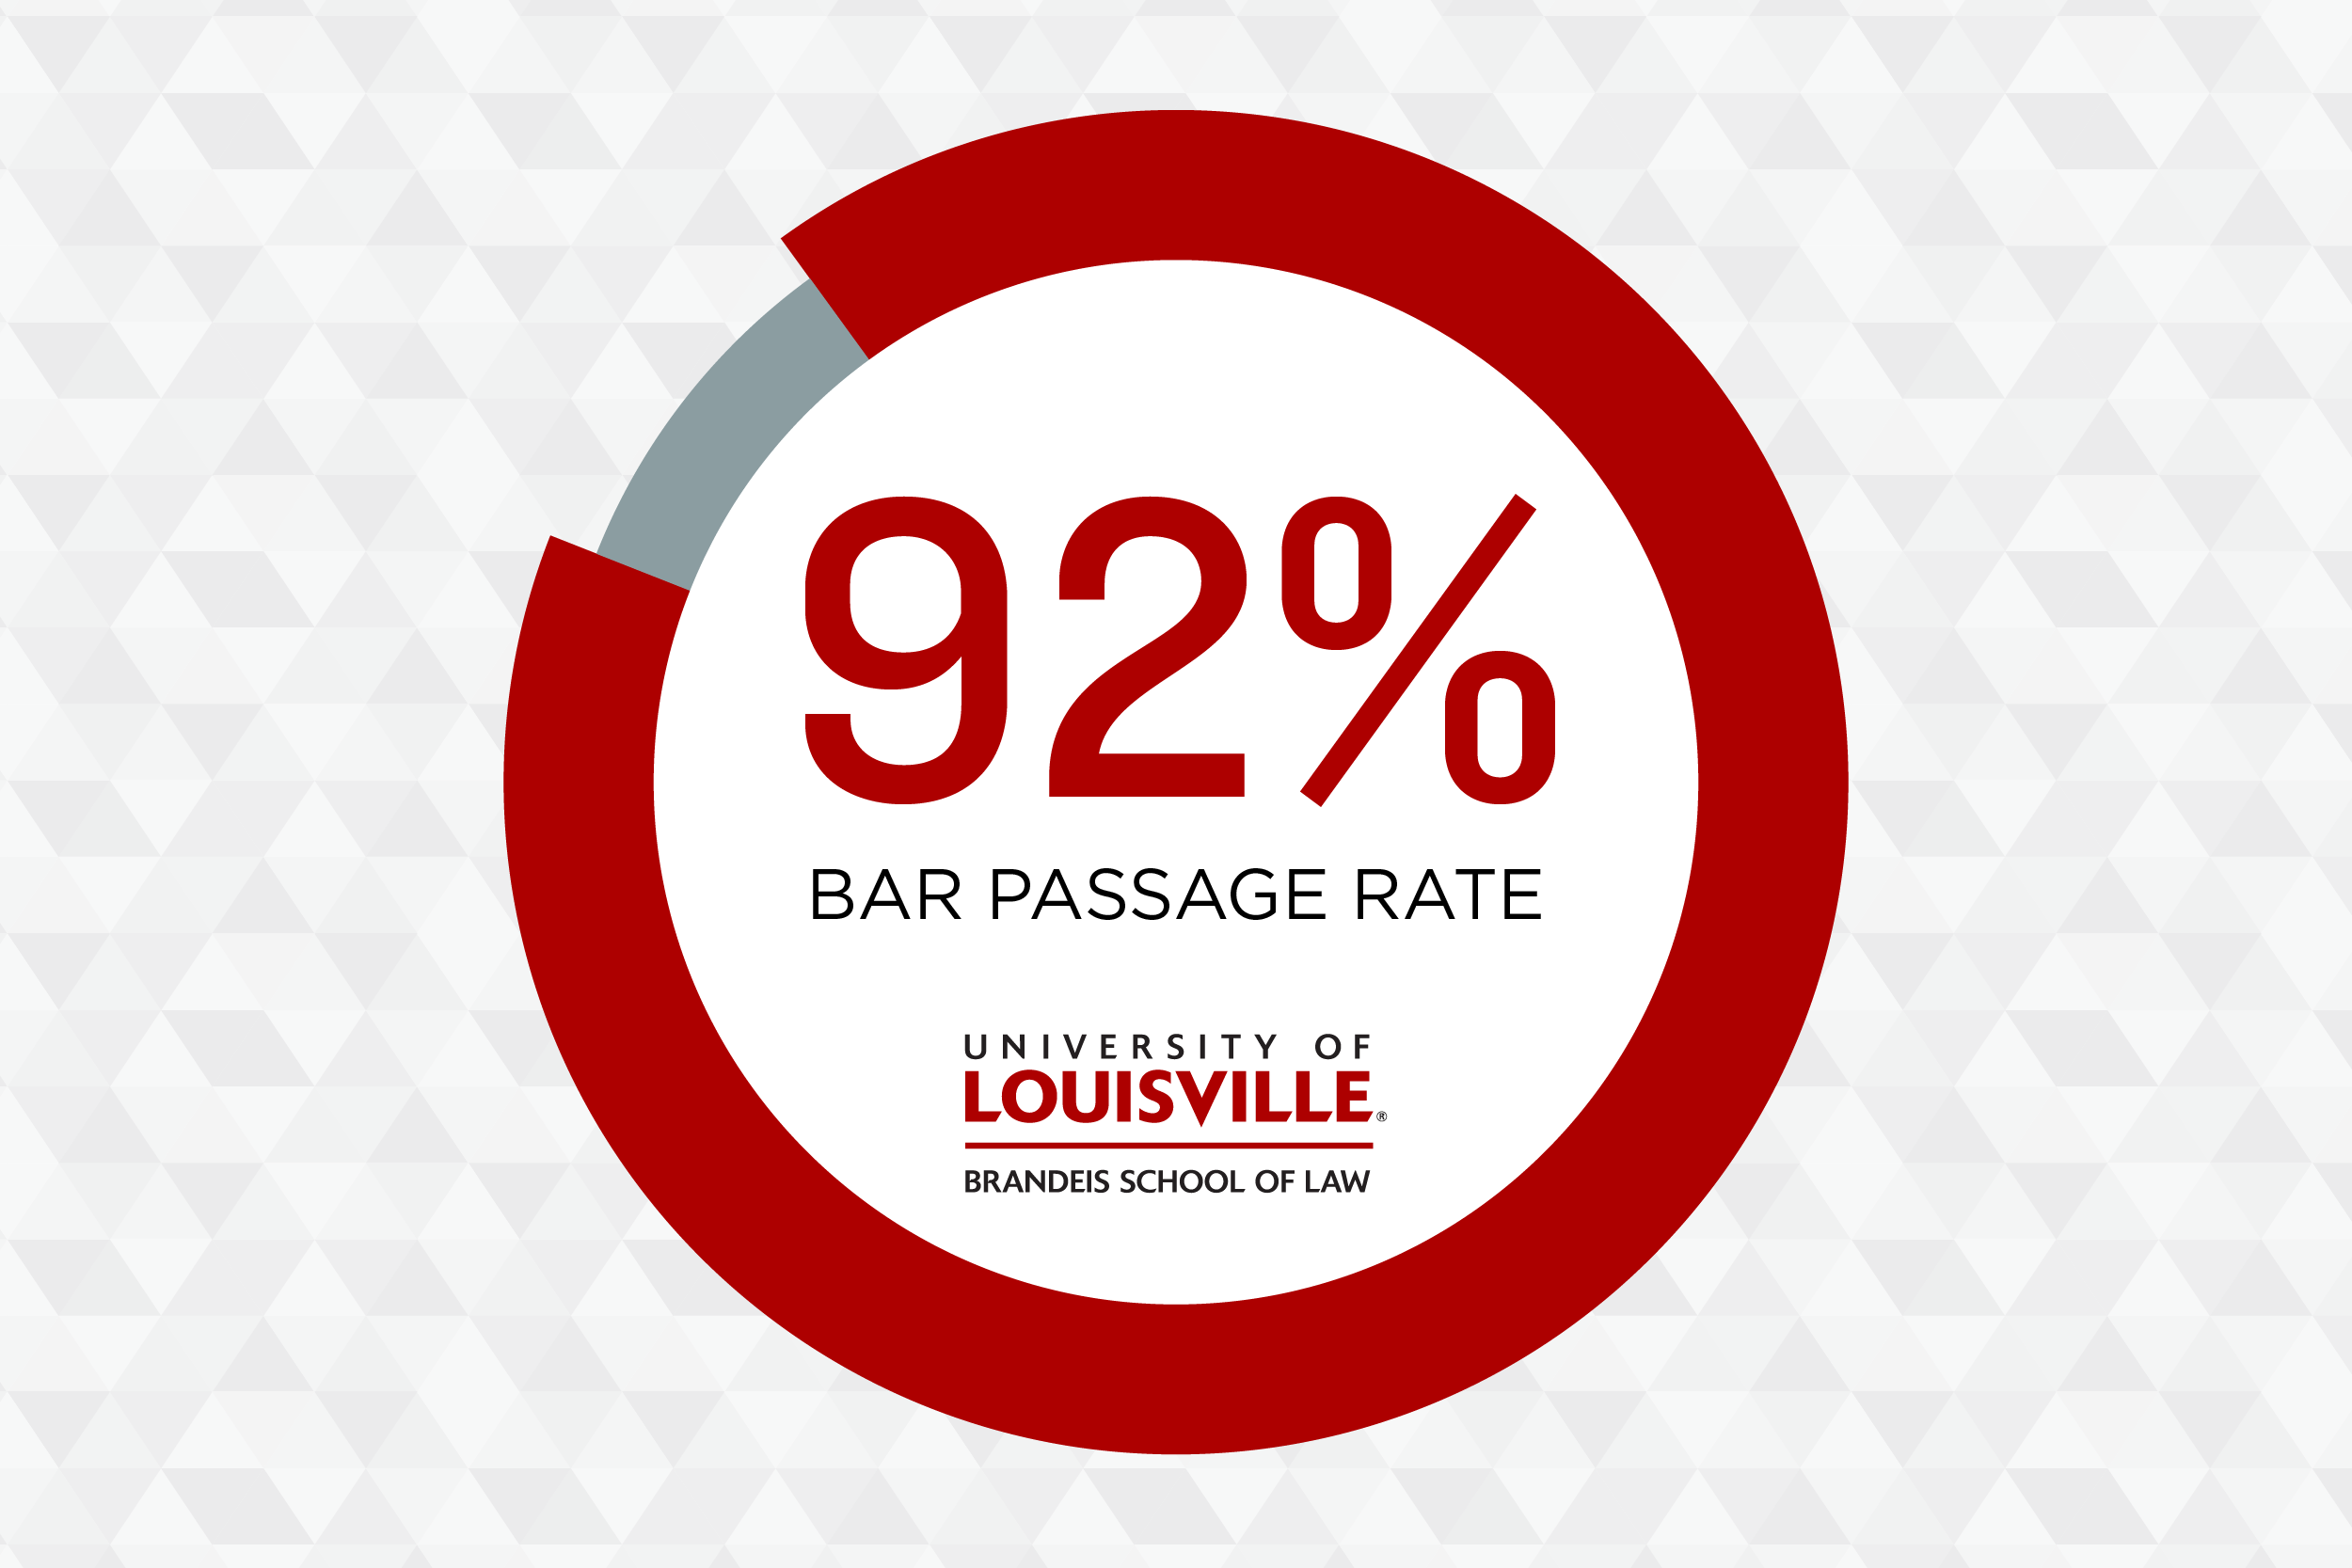 Louisville Law 92% Bar Passage Rate